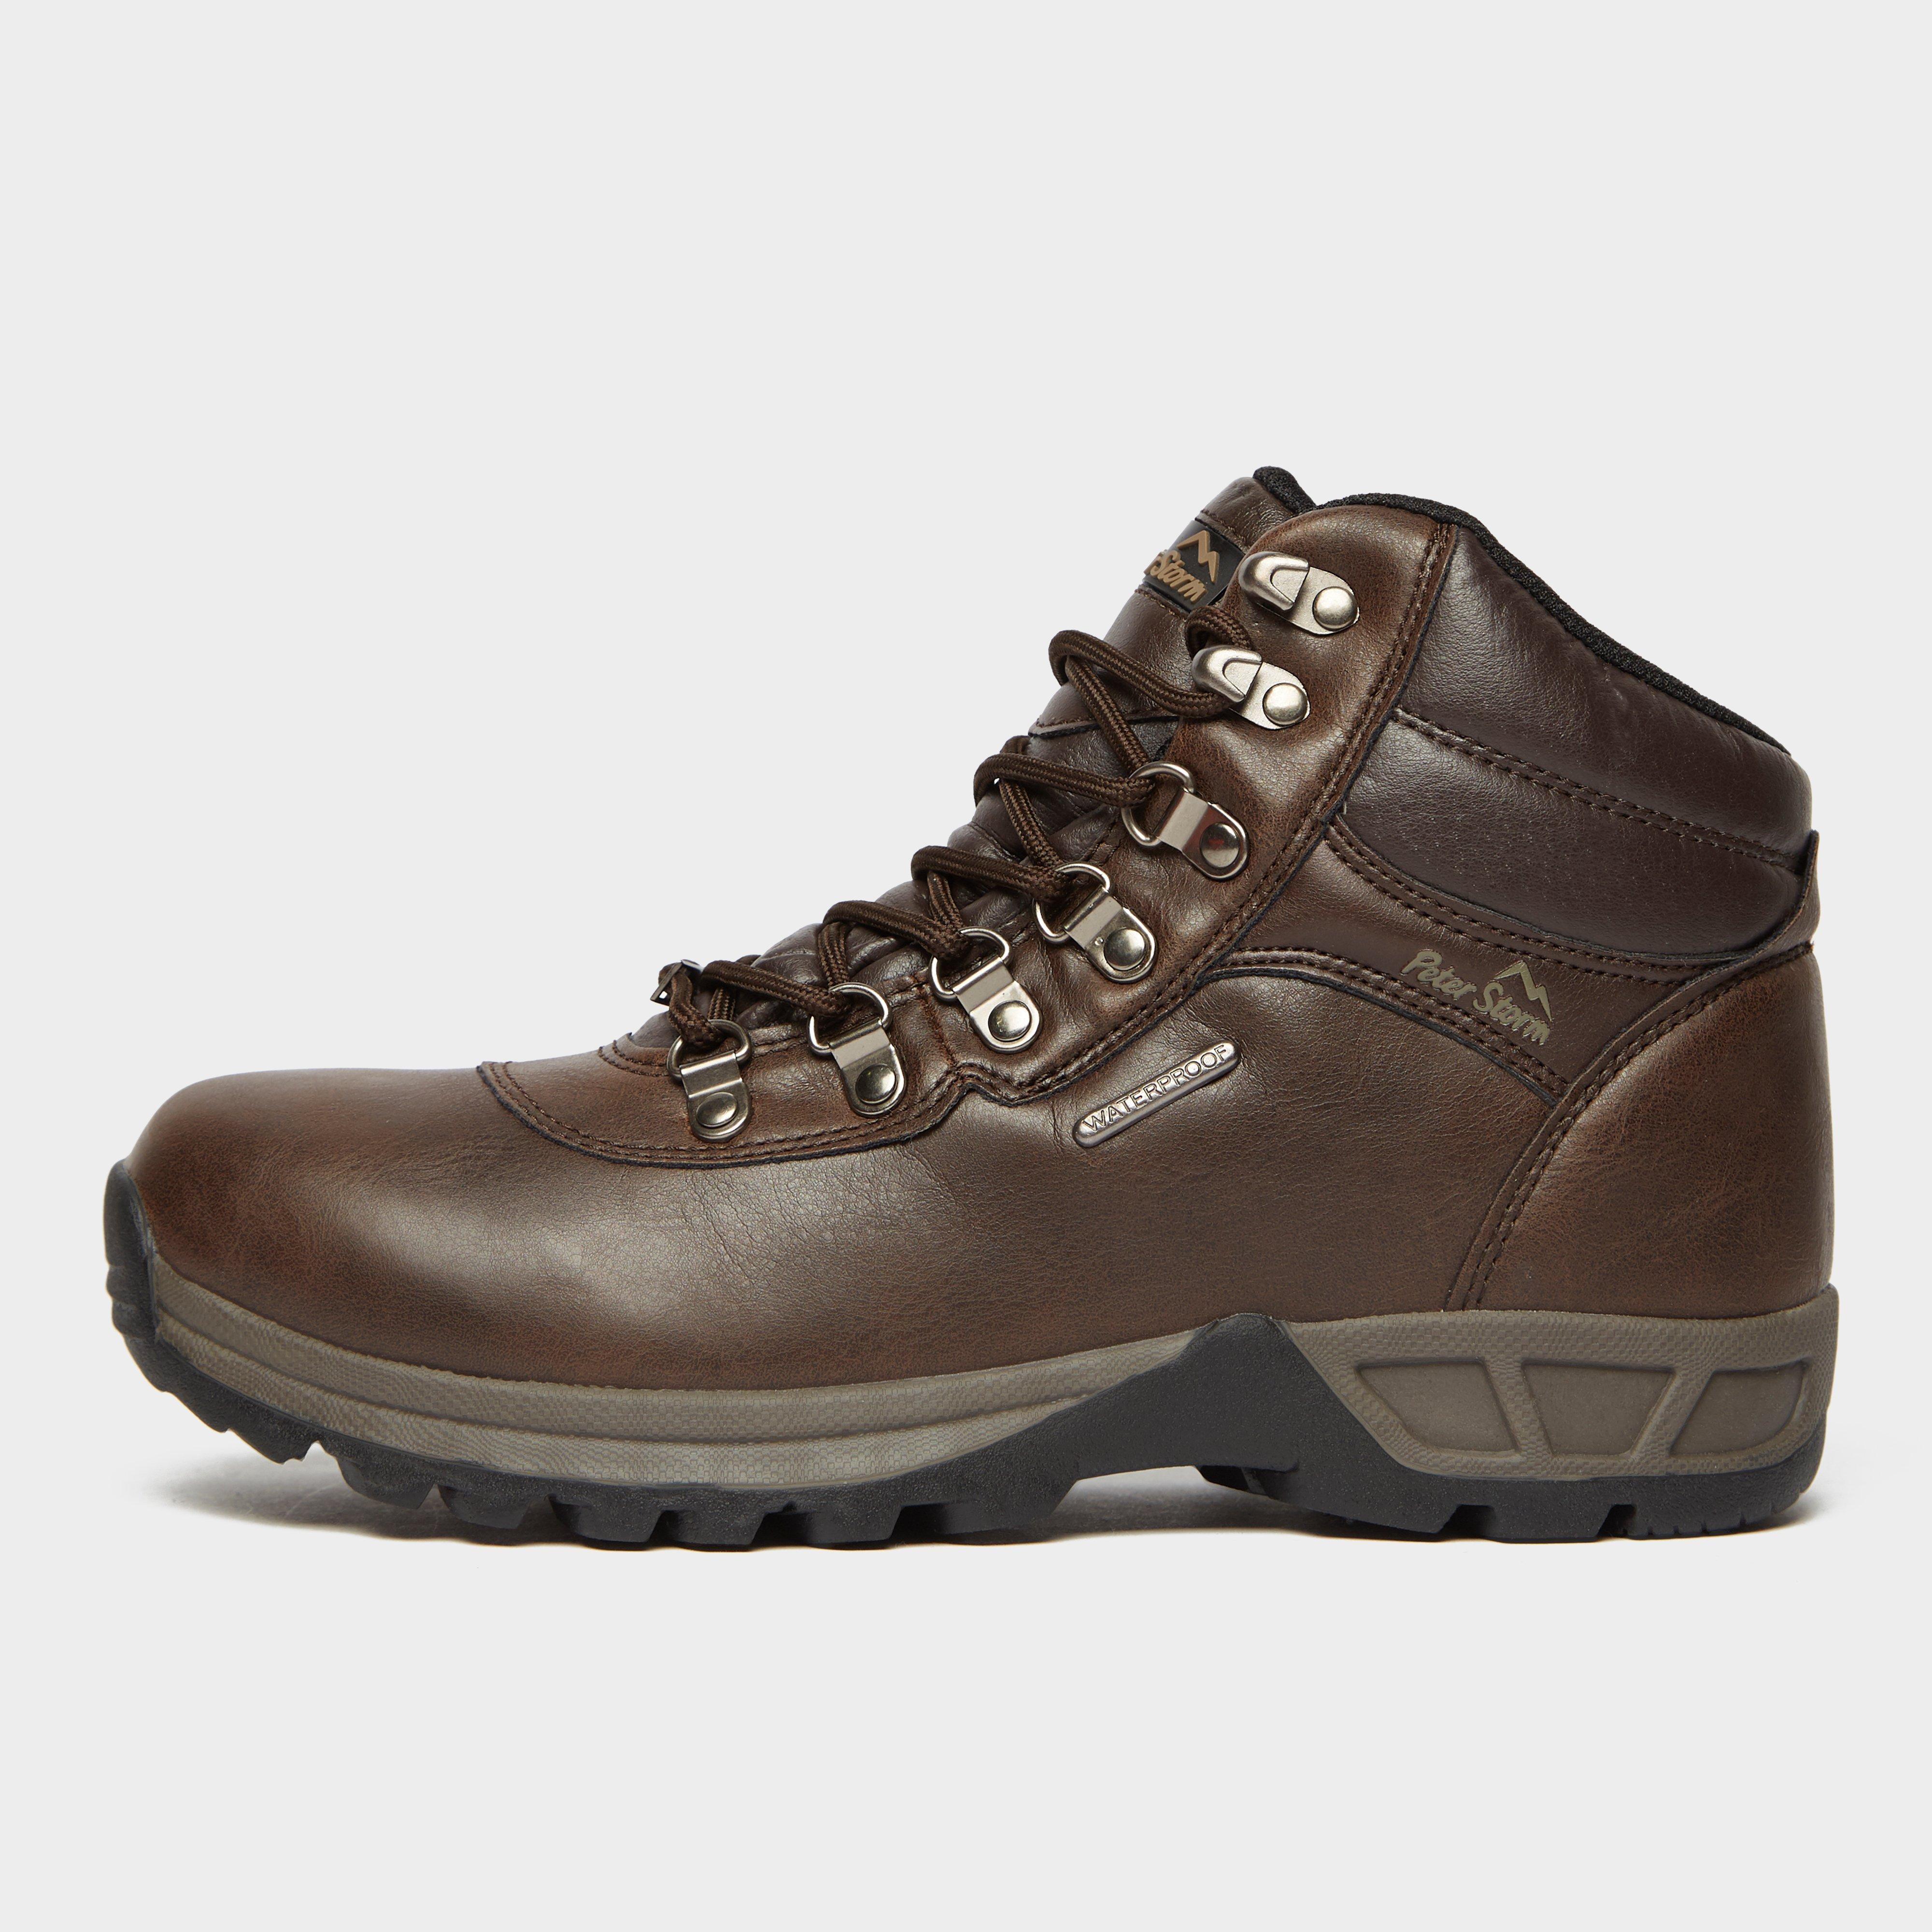 Peter Storm Kids' Rivelin Walking Boots - Brown/Brn, Brown